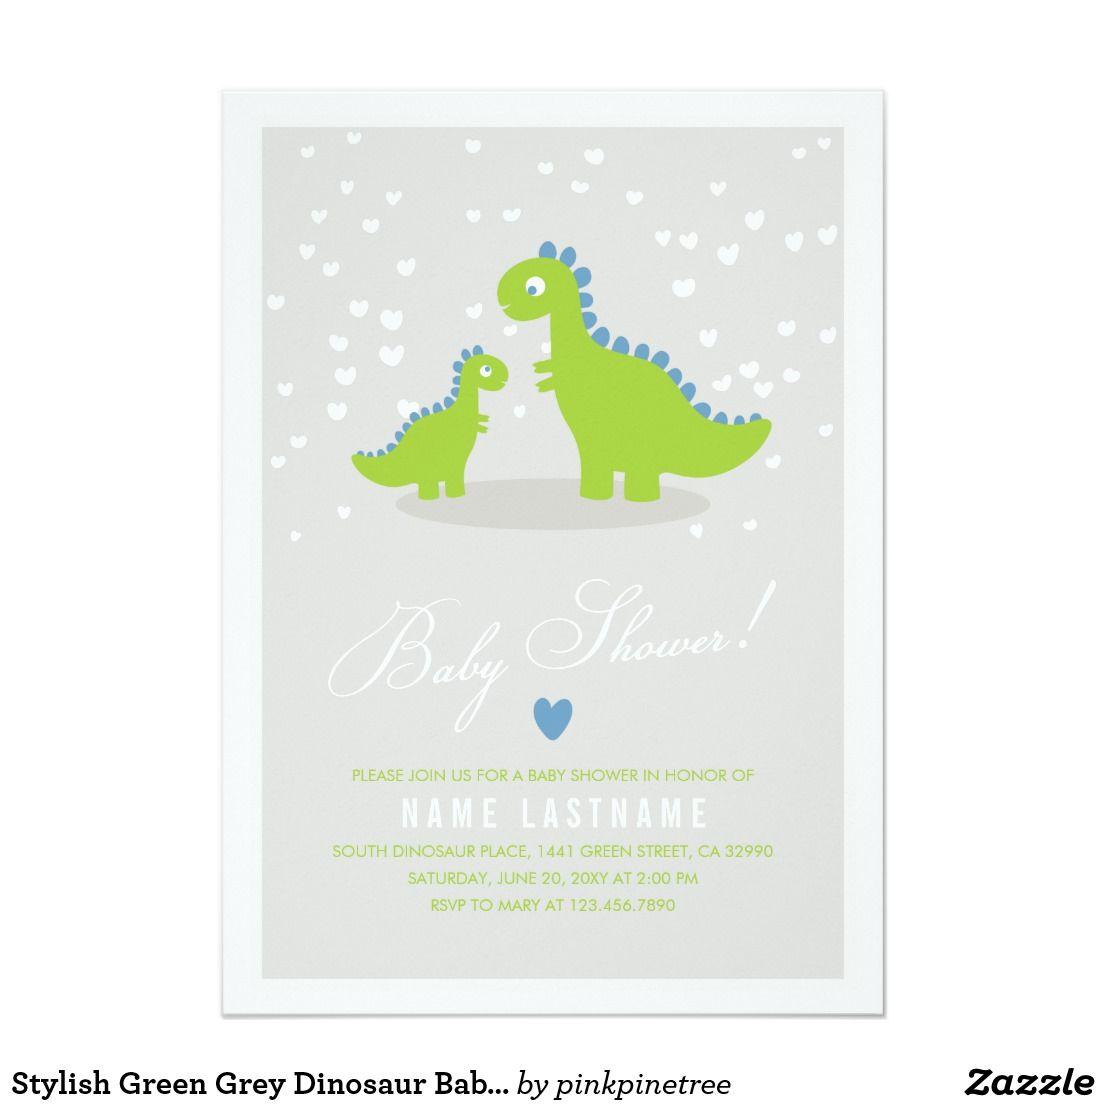 Stylish Green Grey Dinosaur Baby Shower Invitation Customize this ...